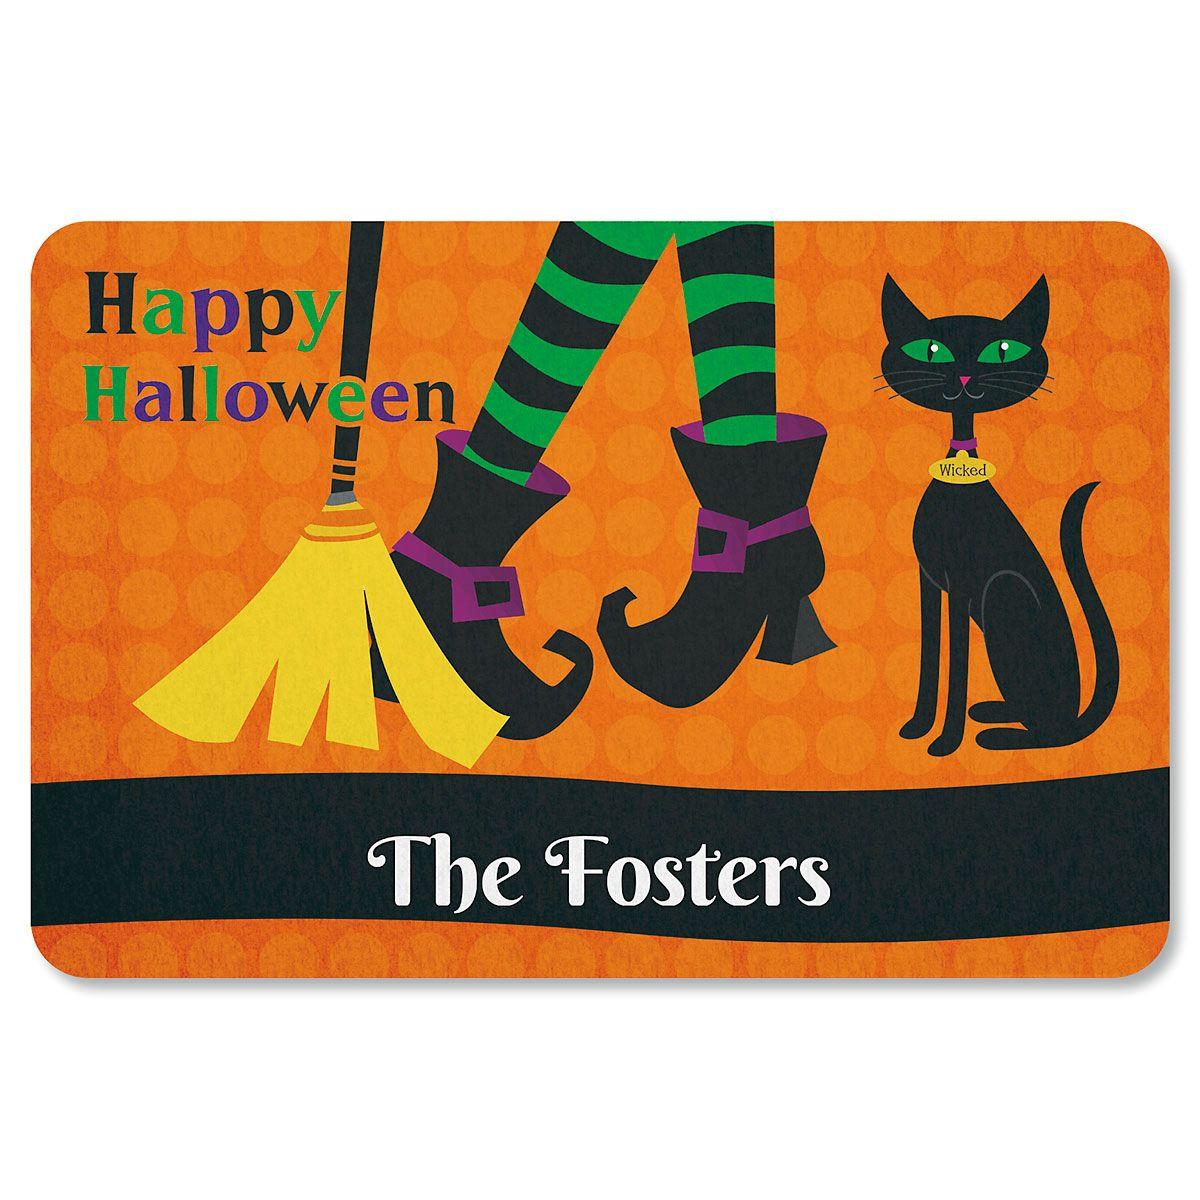 Witch Legs Personalized Halloween Doormat